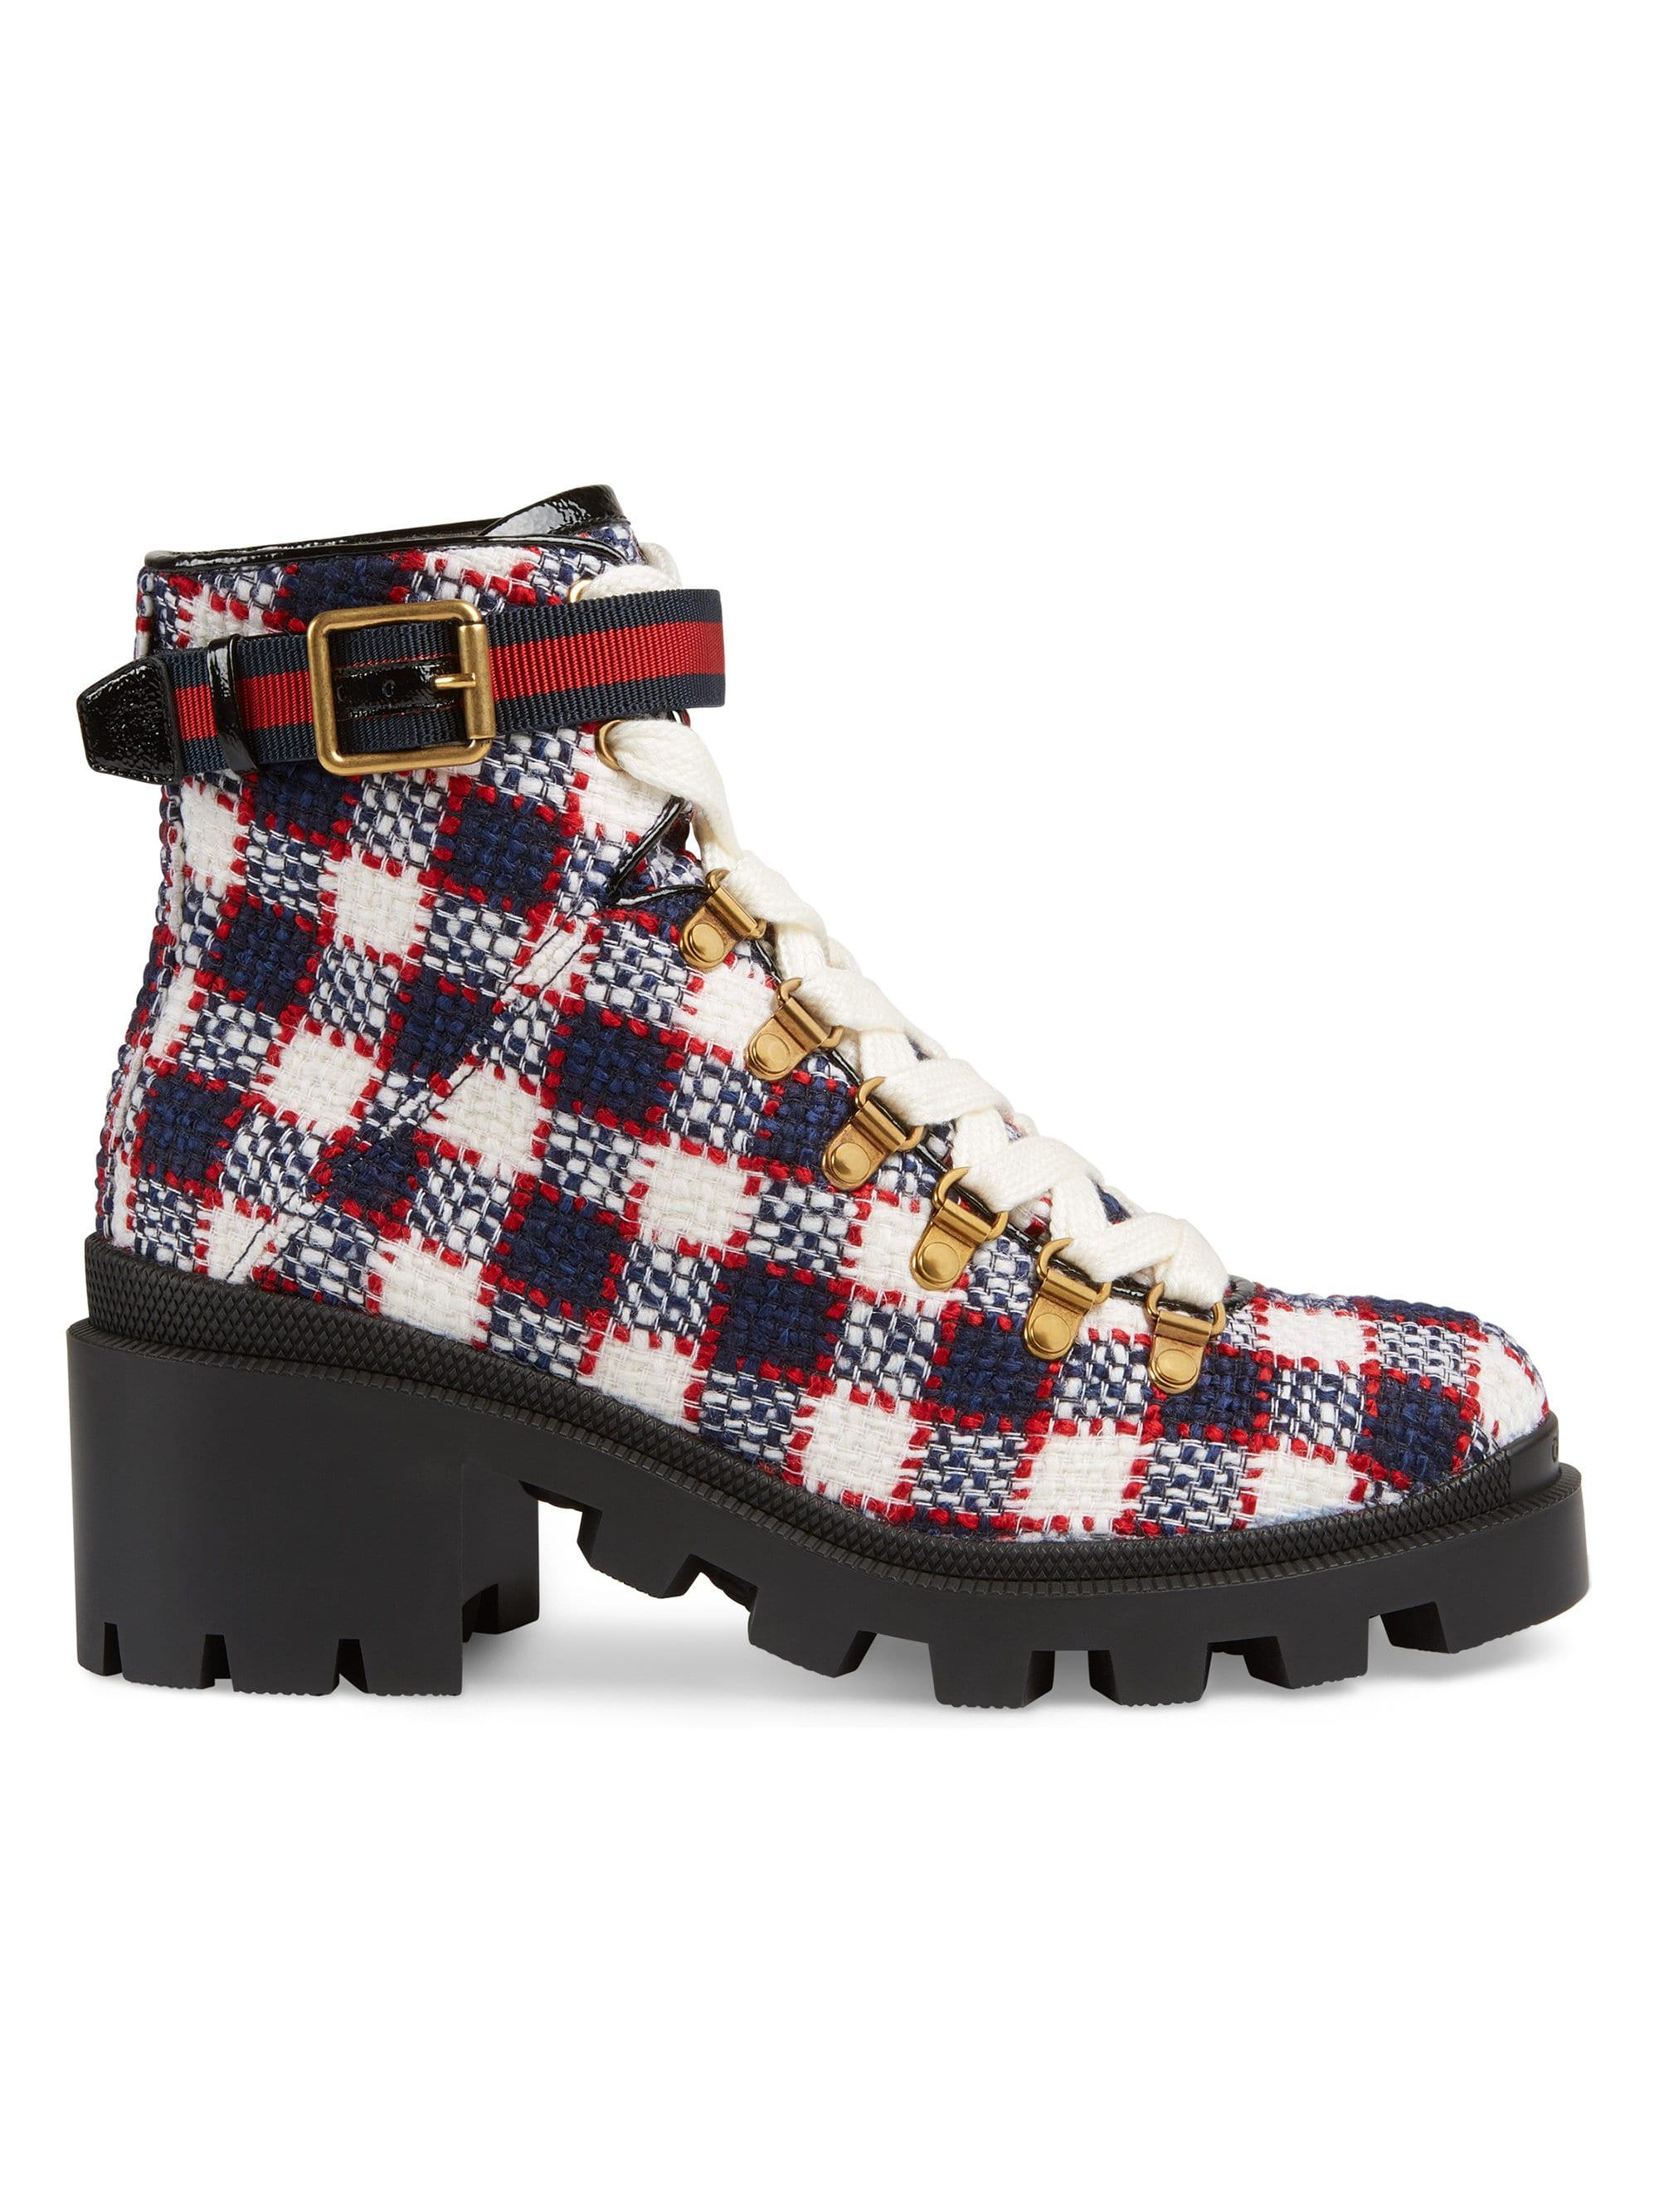 2bf5fc87d Gucci Women's Trip Check Combat Boots - Mystic White - Lyst